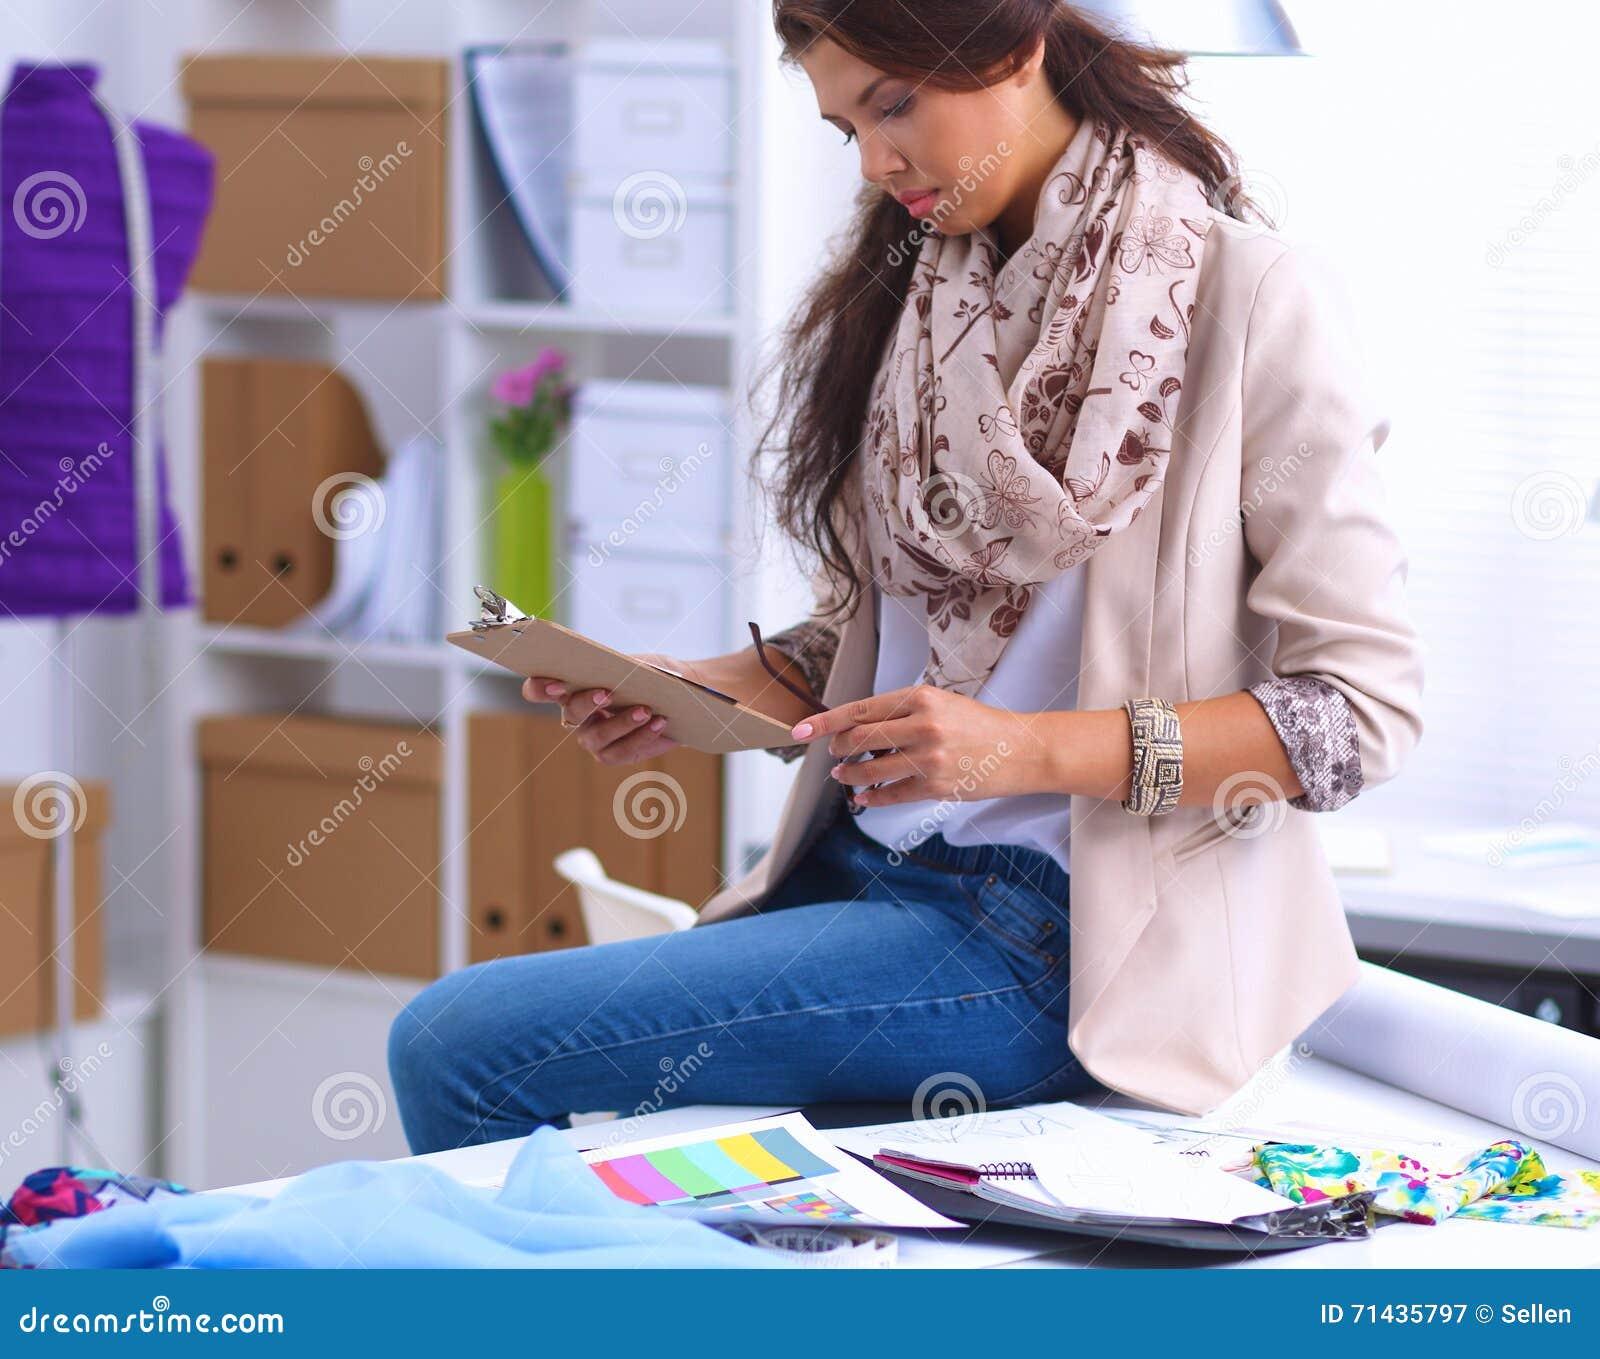 Modern Young Fashion Designer Working At Studio Royalty Free Stock Photo